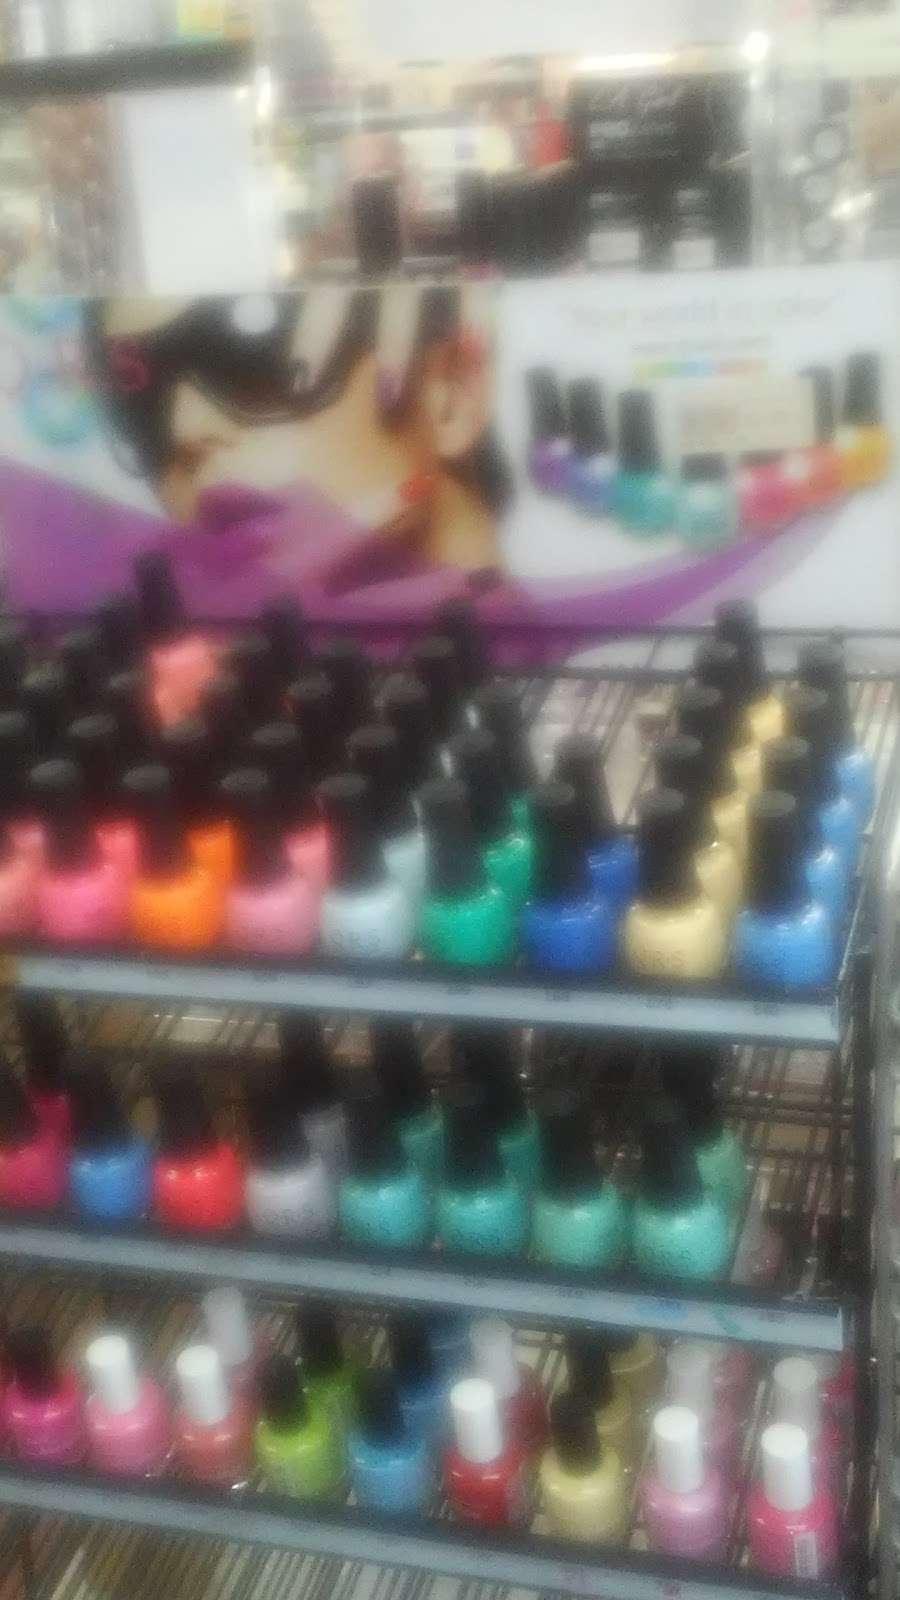 Bijou Beauty Supply - store  | Photo 8 of 10 | Address: Family Dolla Plaza, 1347 Kennedy Blvd, Bayonne, NJ 07002, USA | Phone: (201) 339-9910